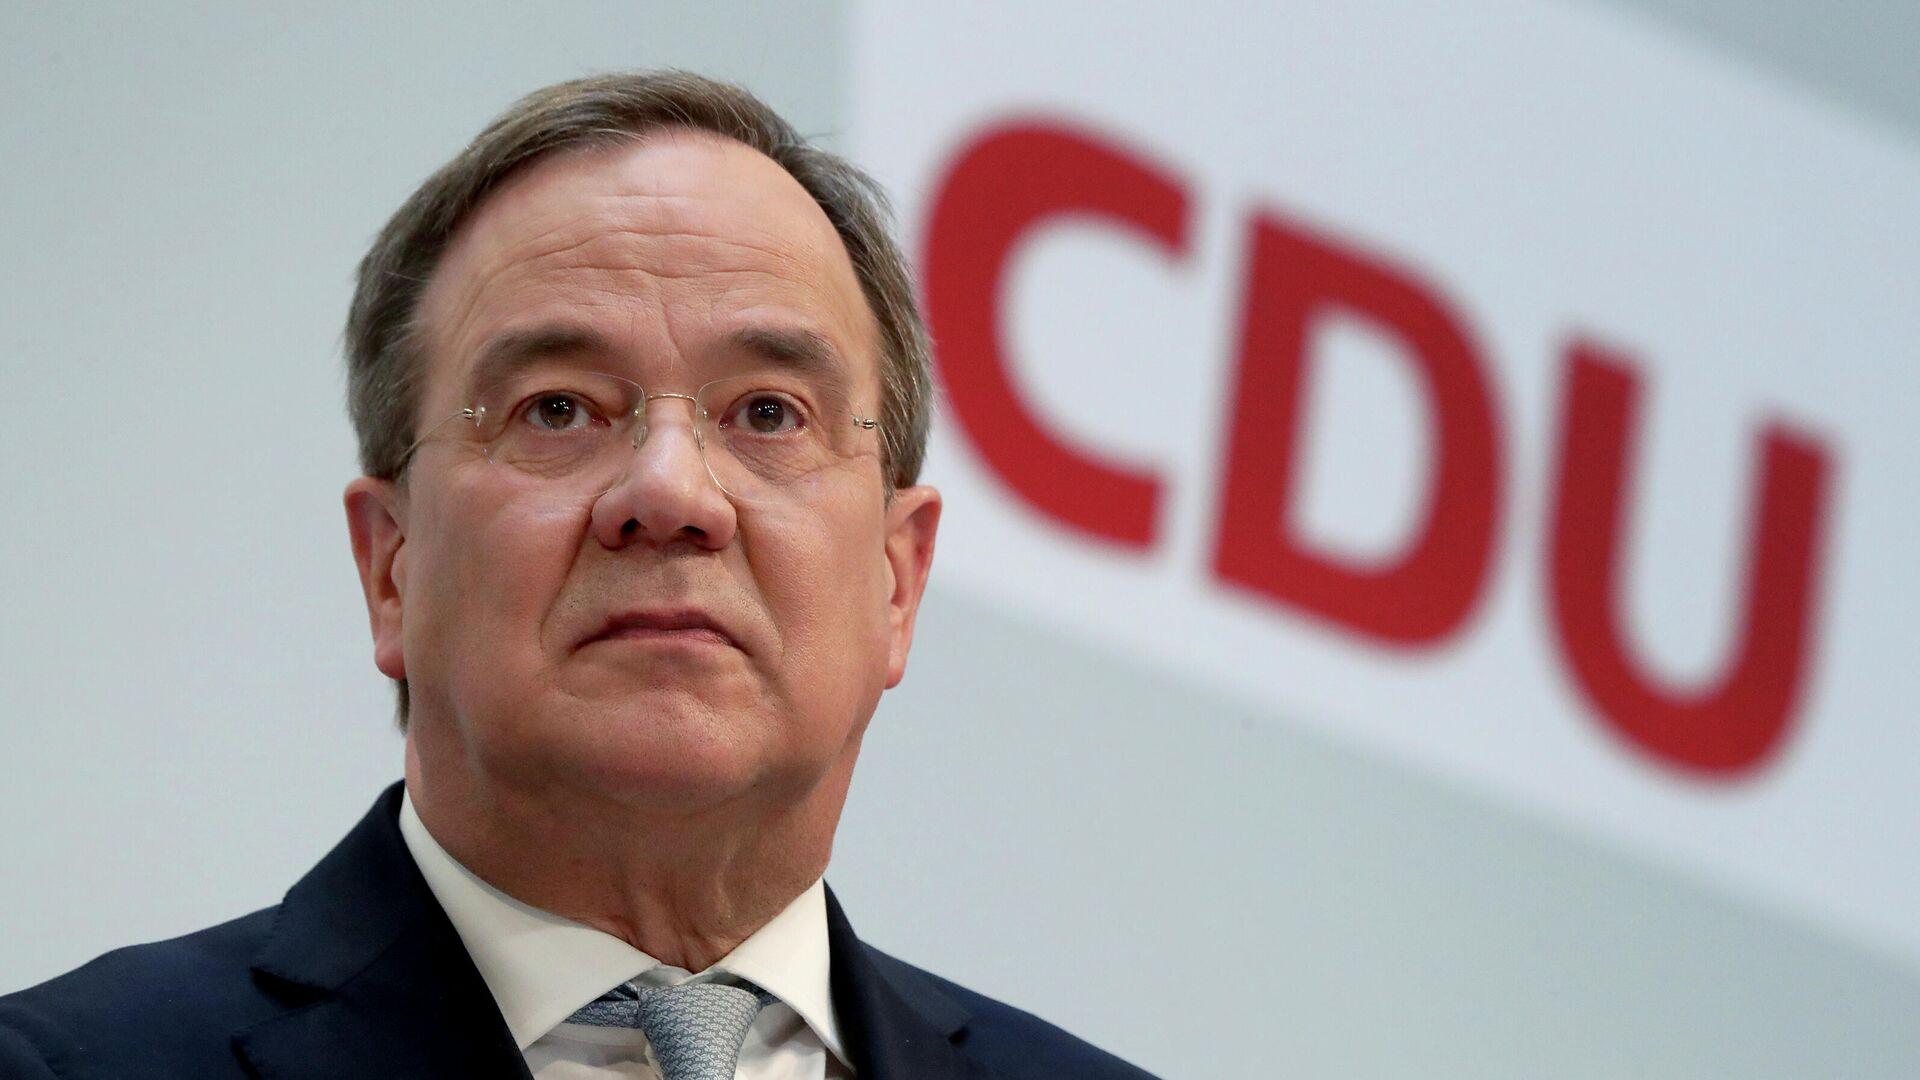 Armin Laschet, presidente del partido Unión Demócrata Cristiana de Alemania (CDU) - Sputnik Mundo, 1920, 19.04.2021